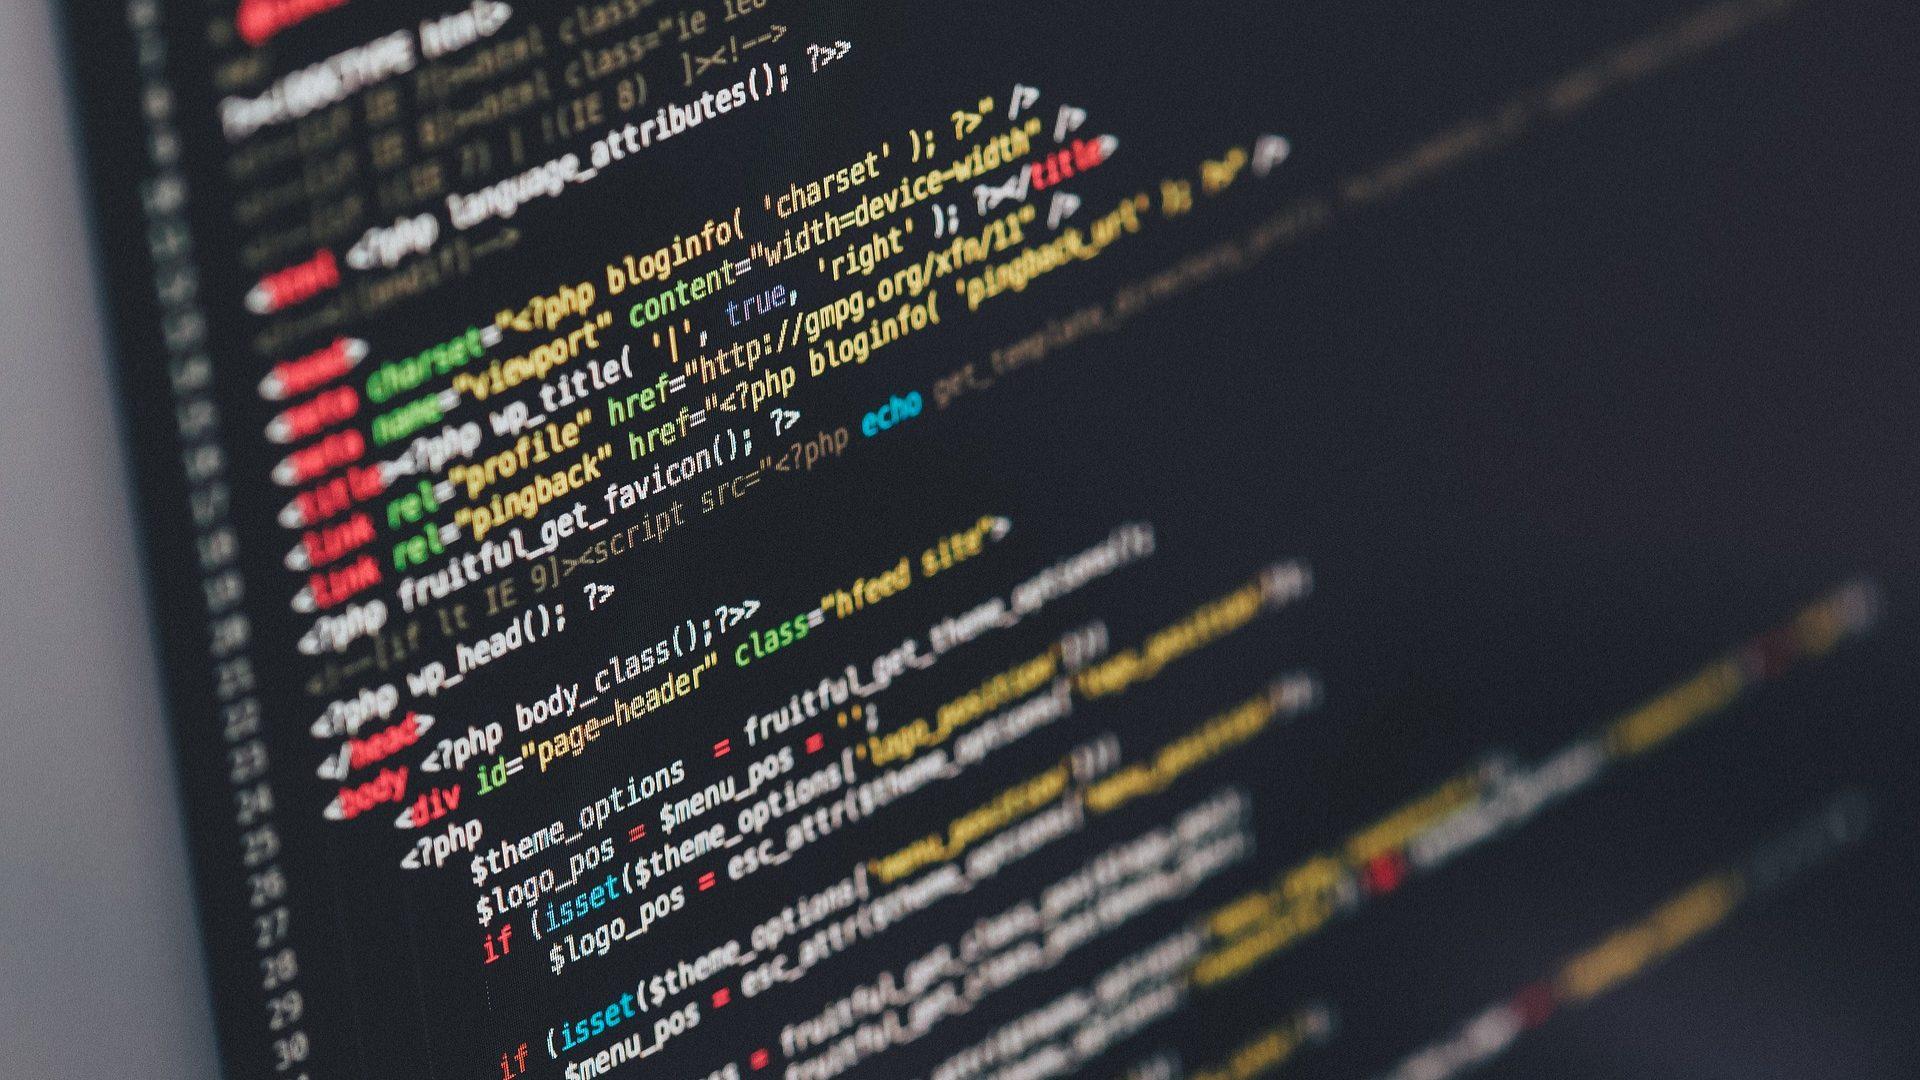 Negócio fechado. Academia de Código compra Codeplace